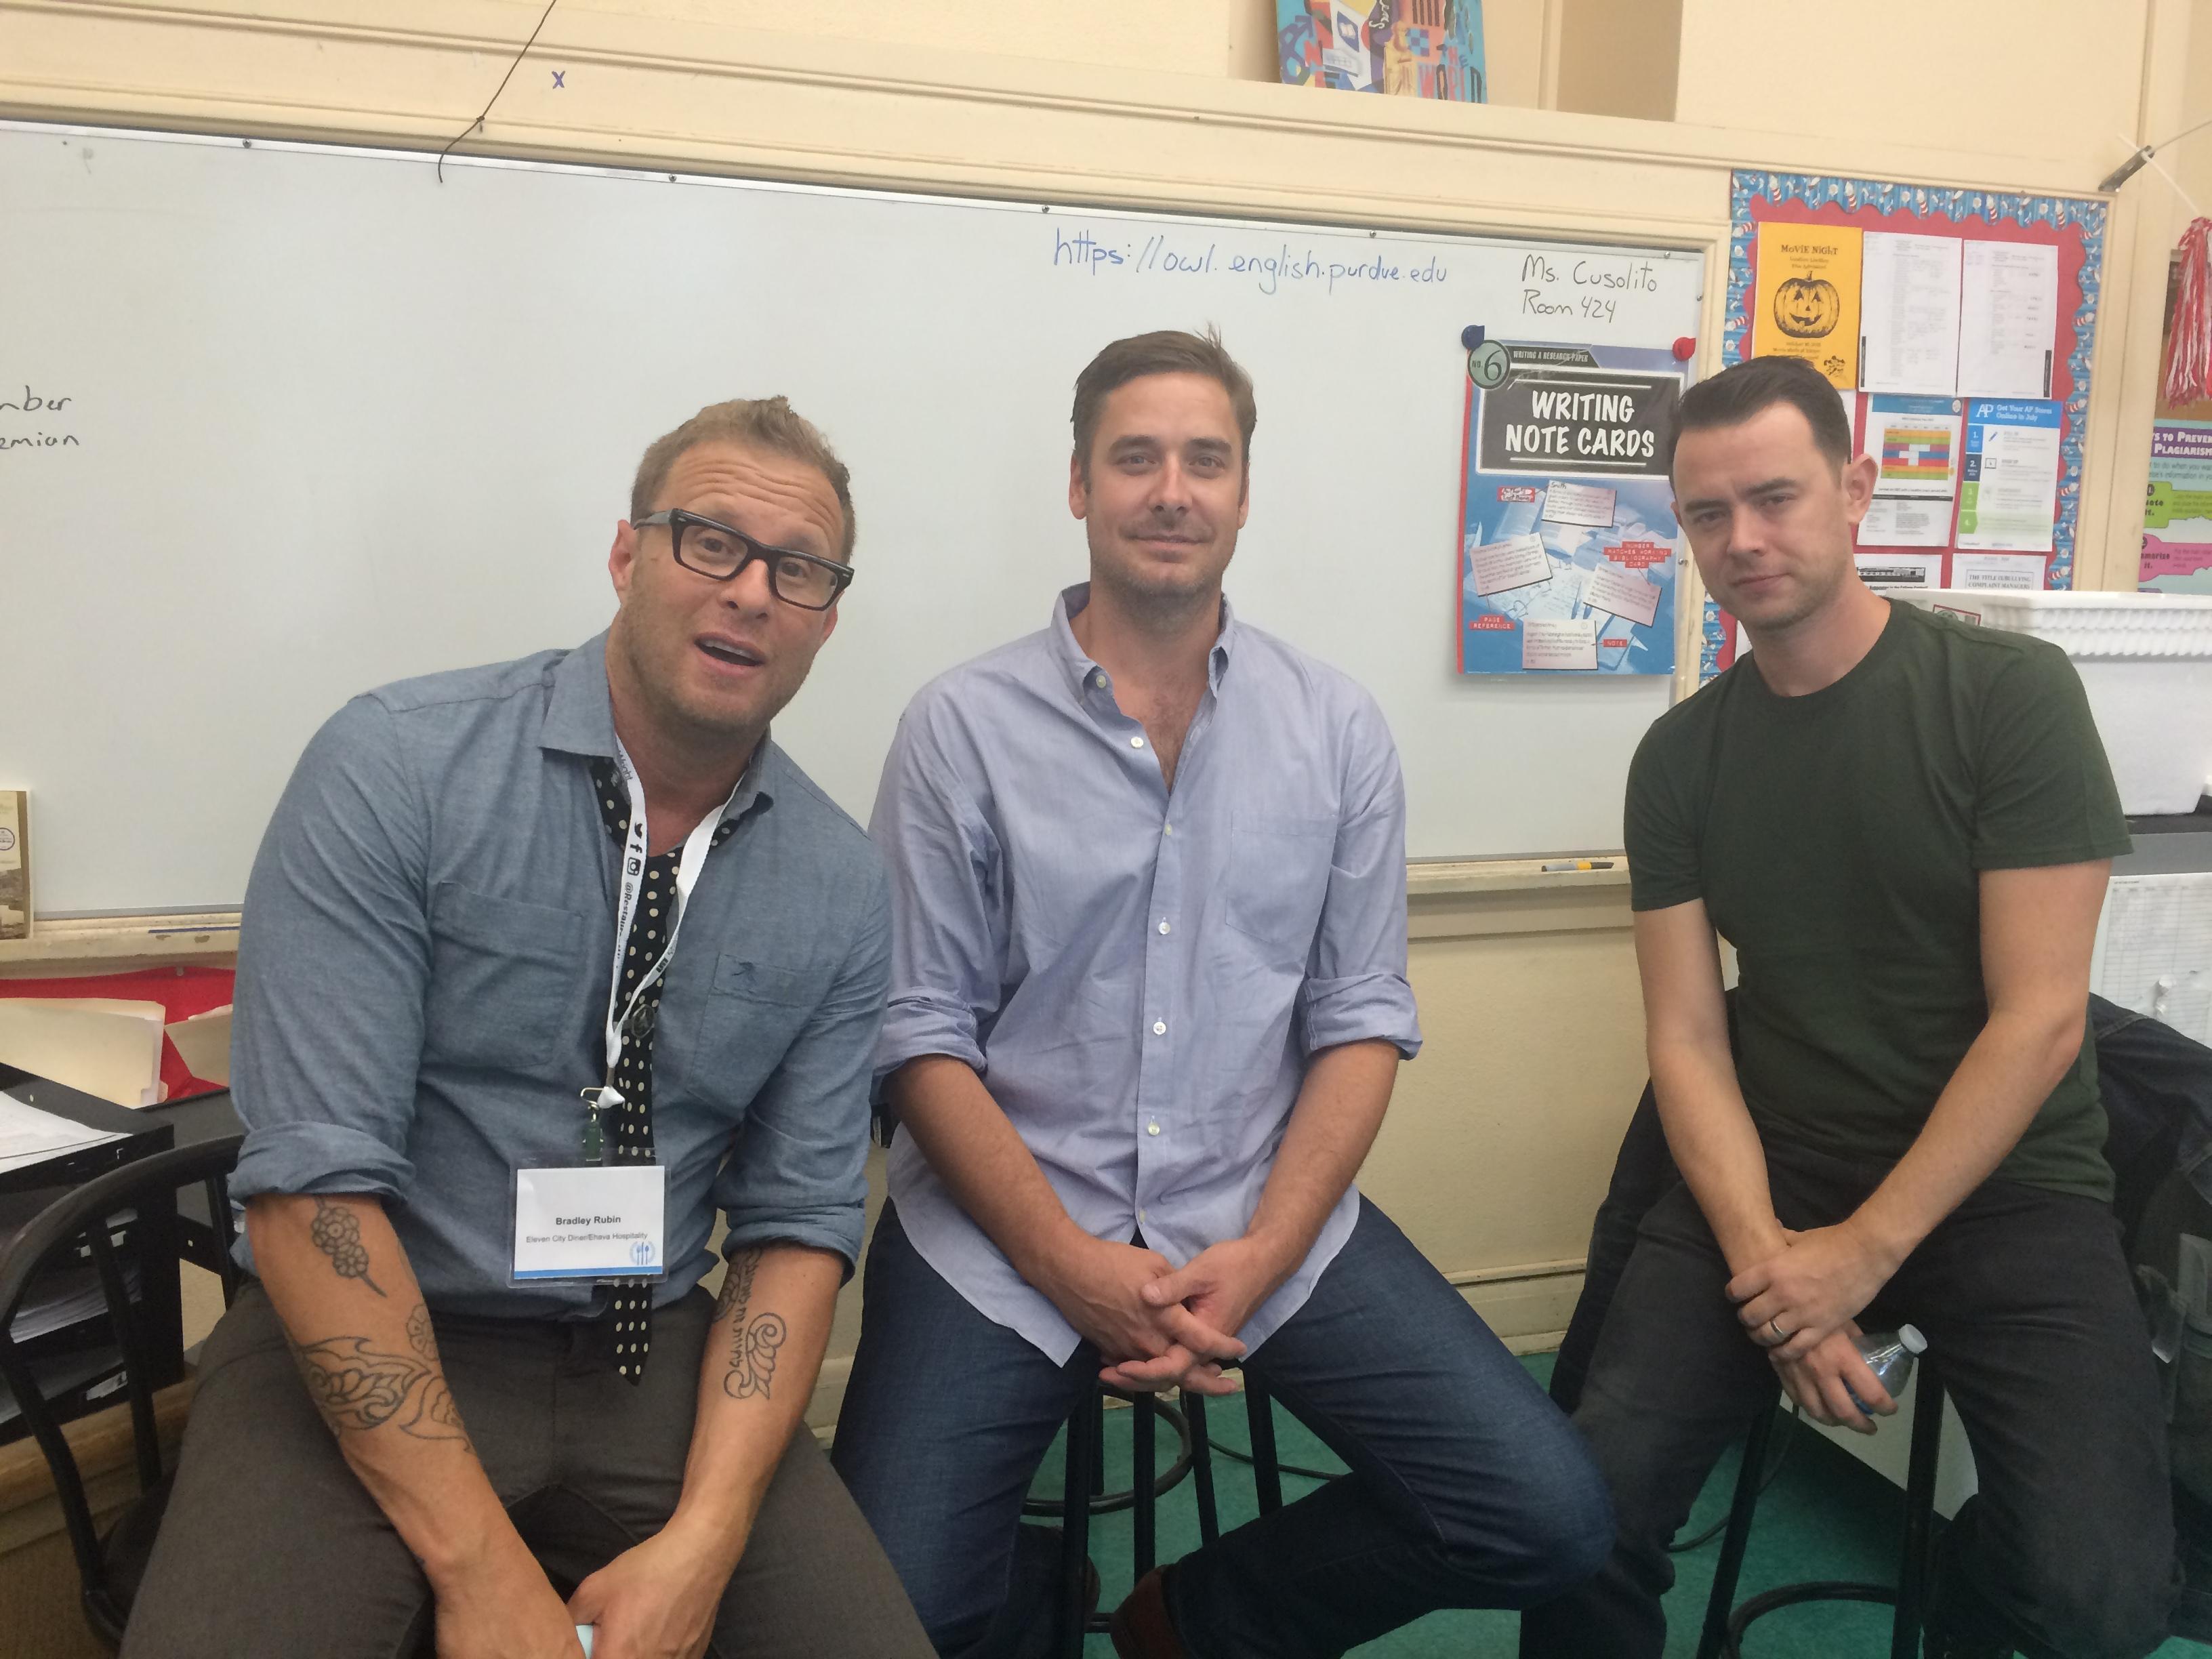 Colin Hanks and Sean Stuart Discuss Filmmaking